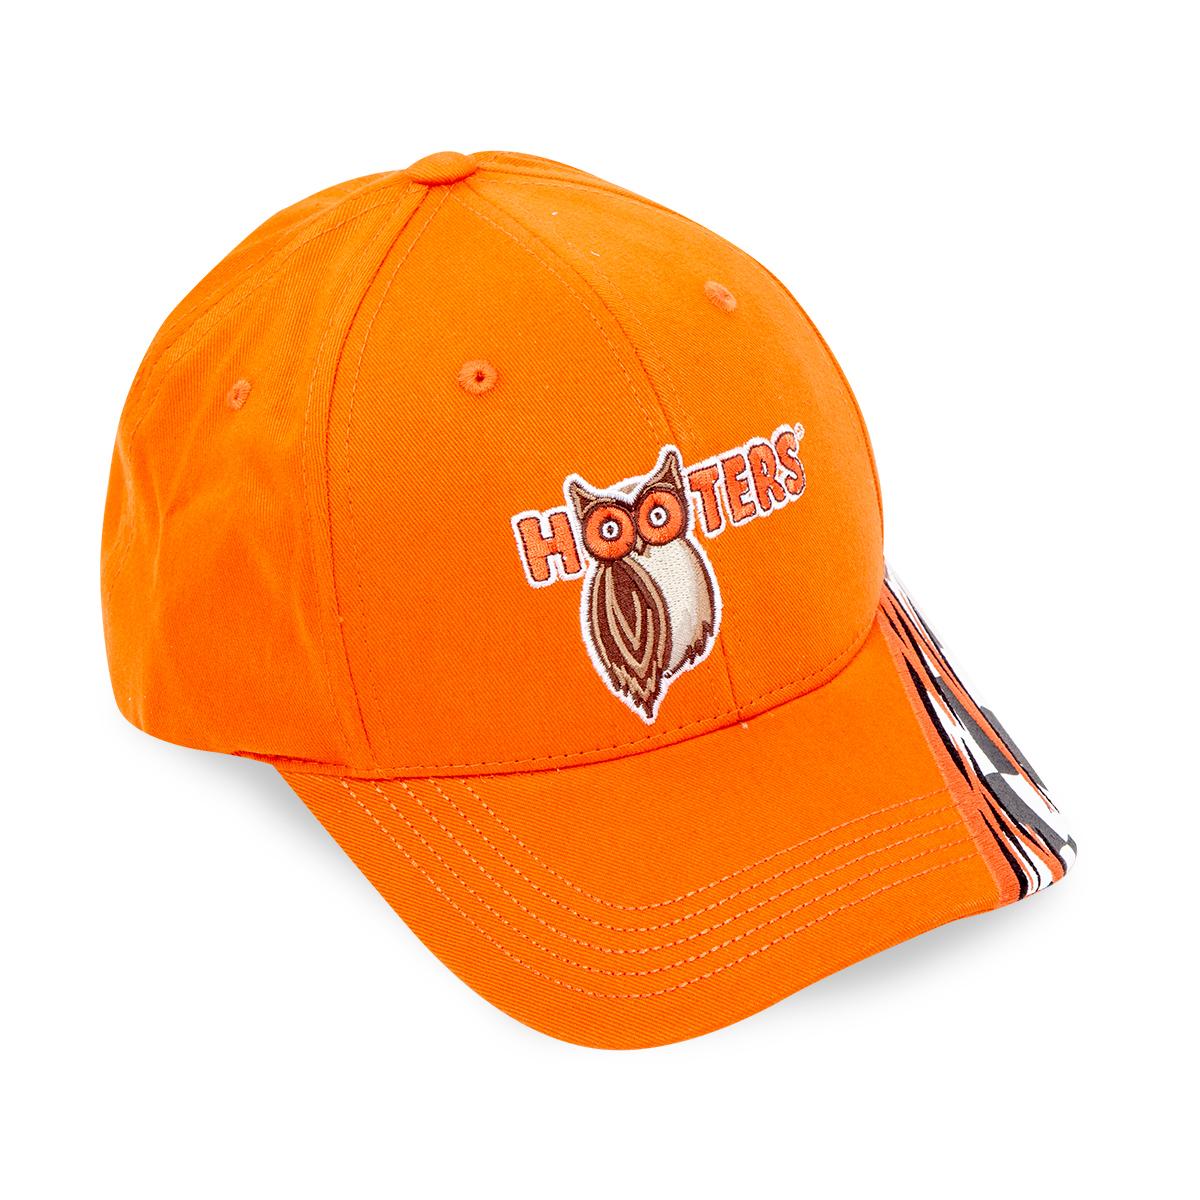 Chase Elliott #9 2017 Hooters Element Hat